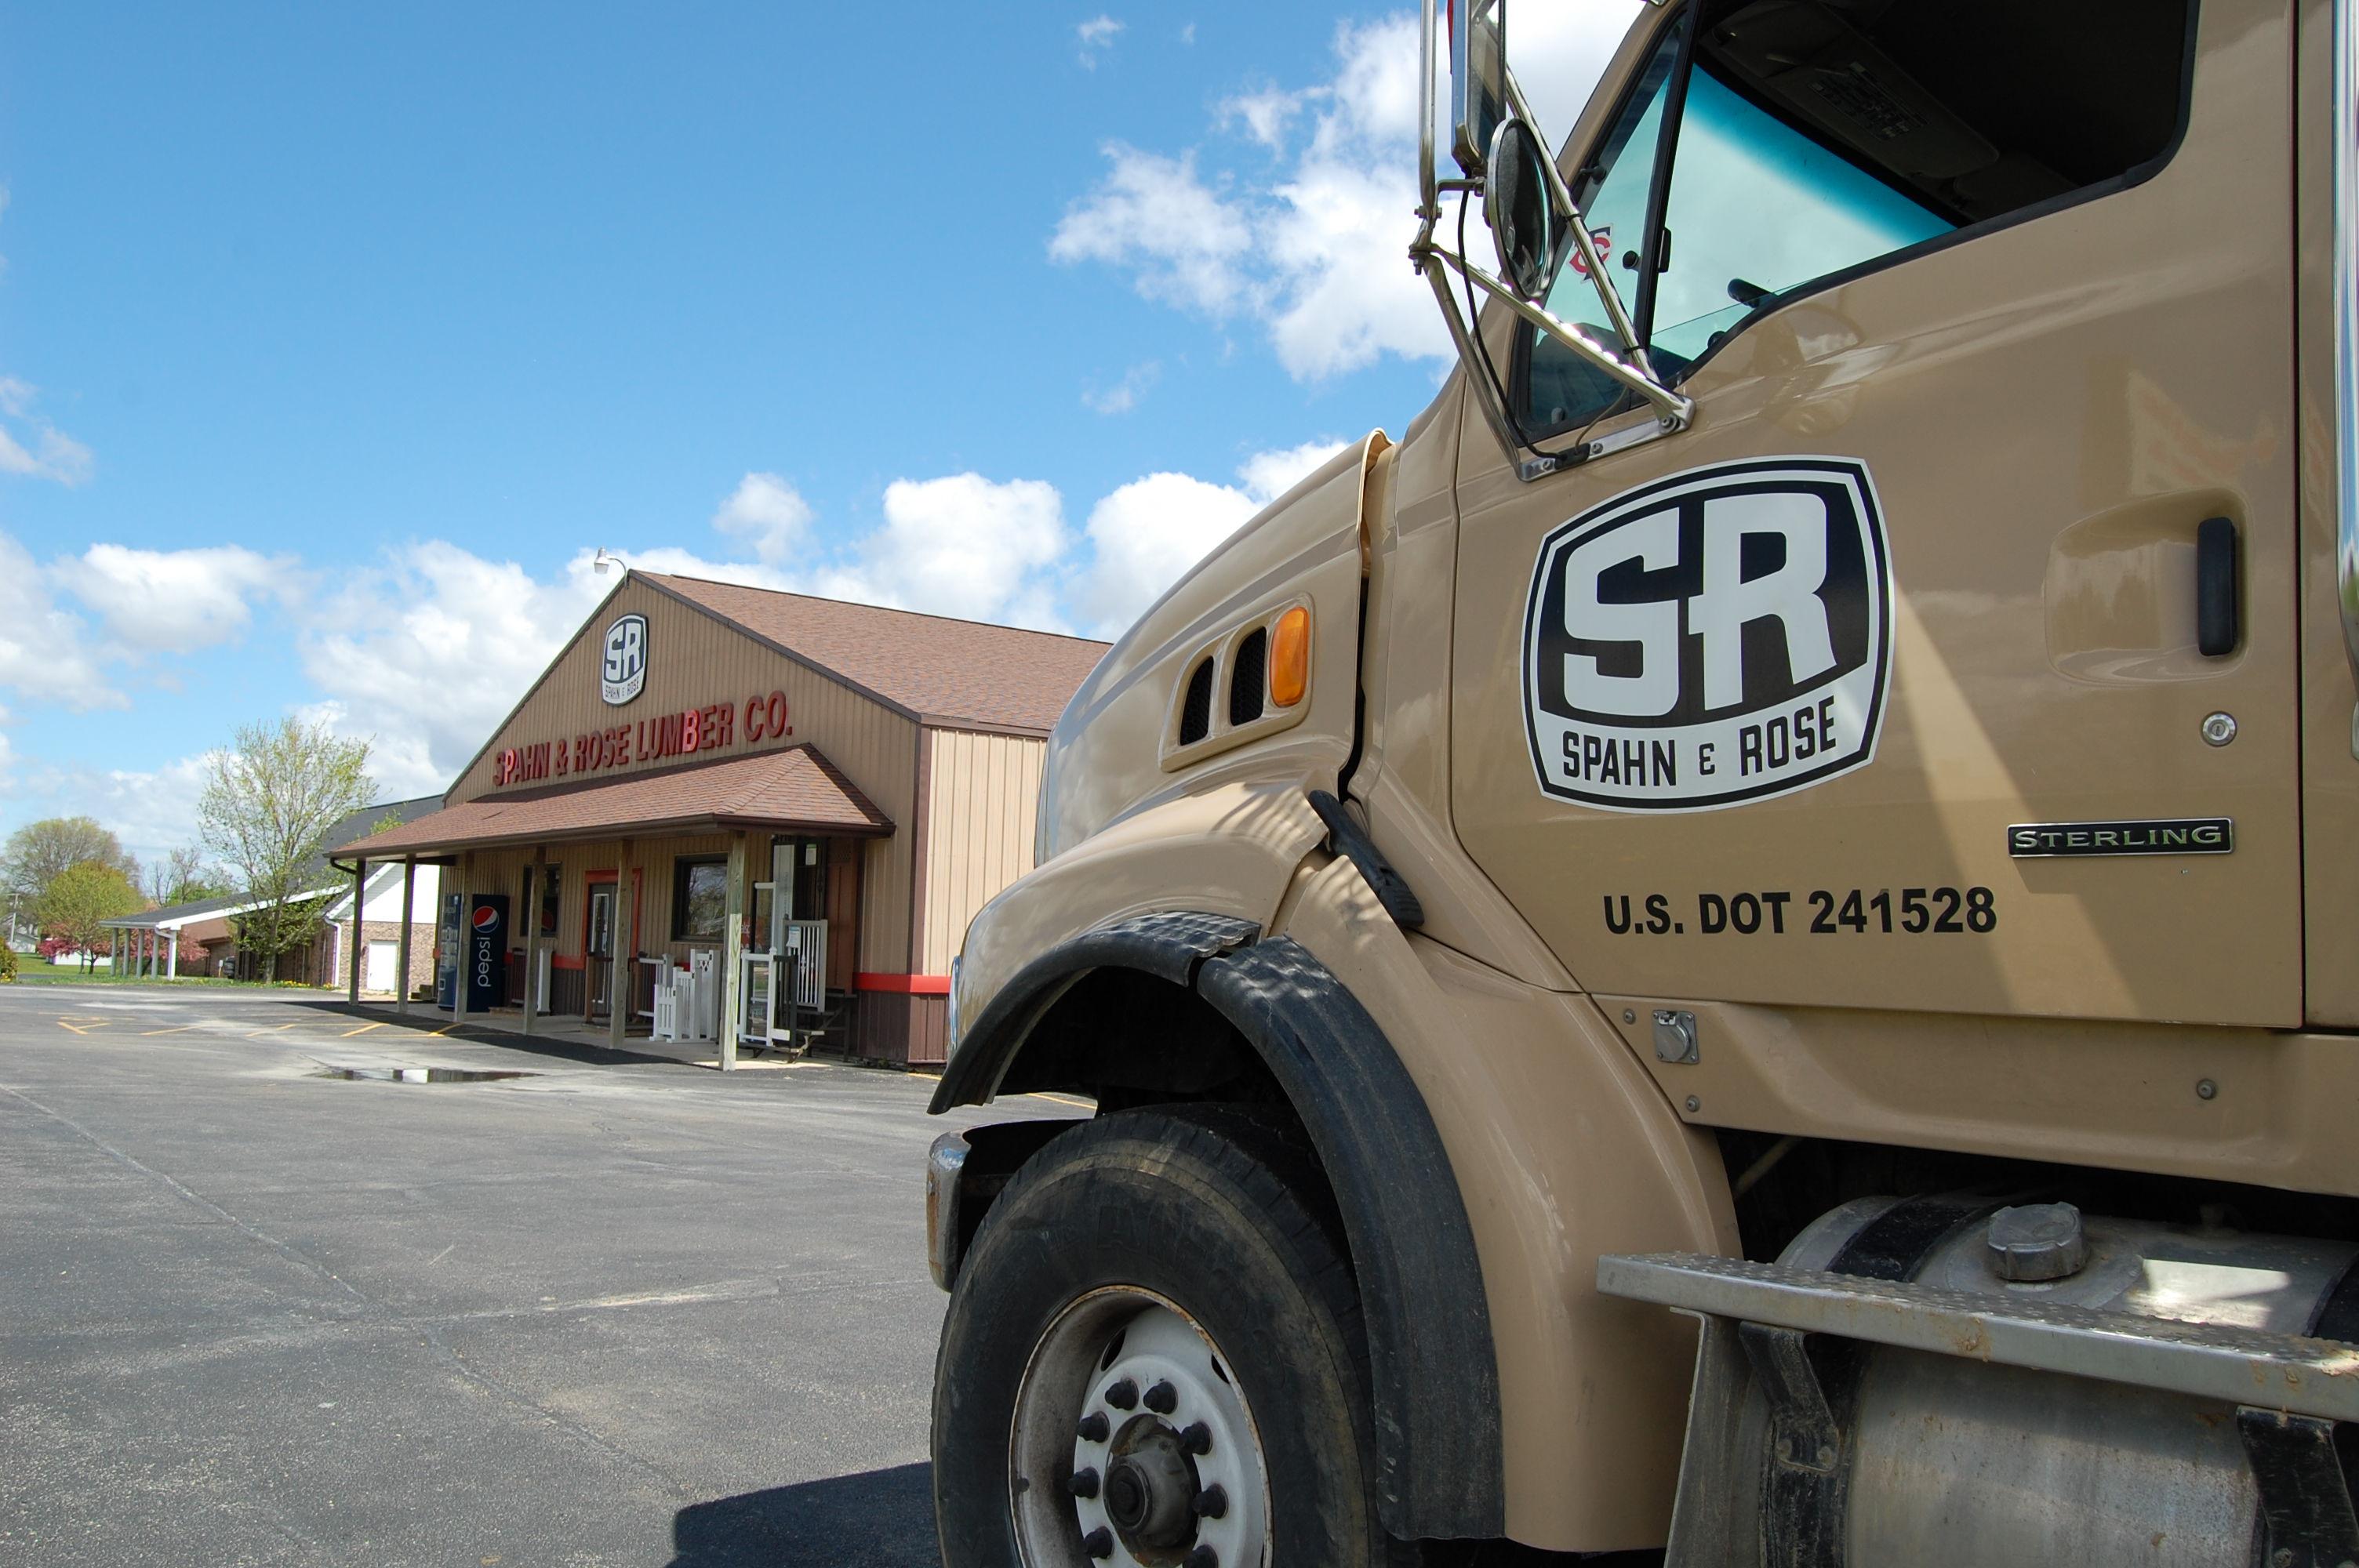 Spahn & Rose Truck-Pearl City